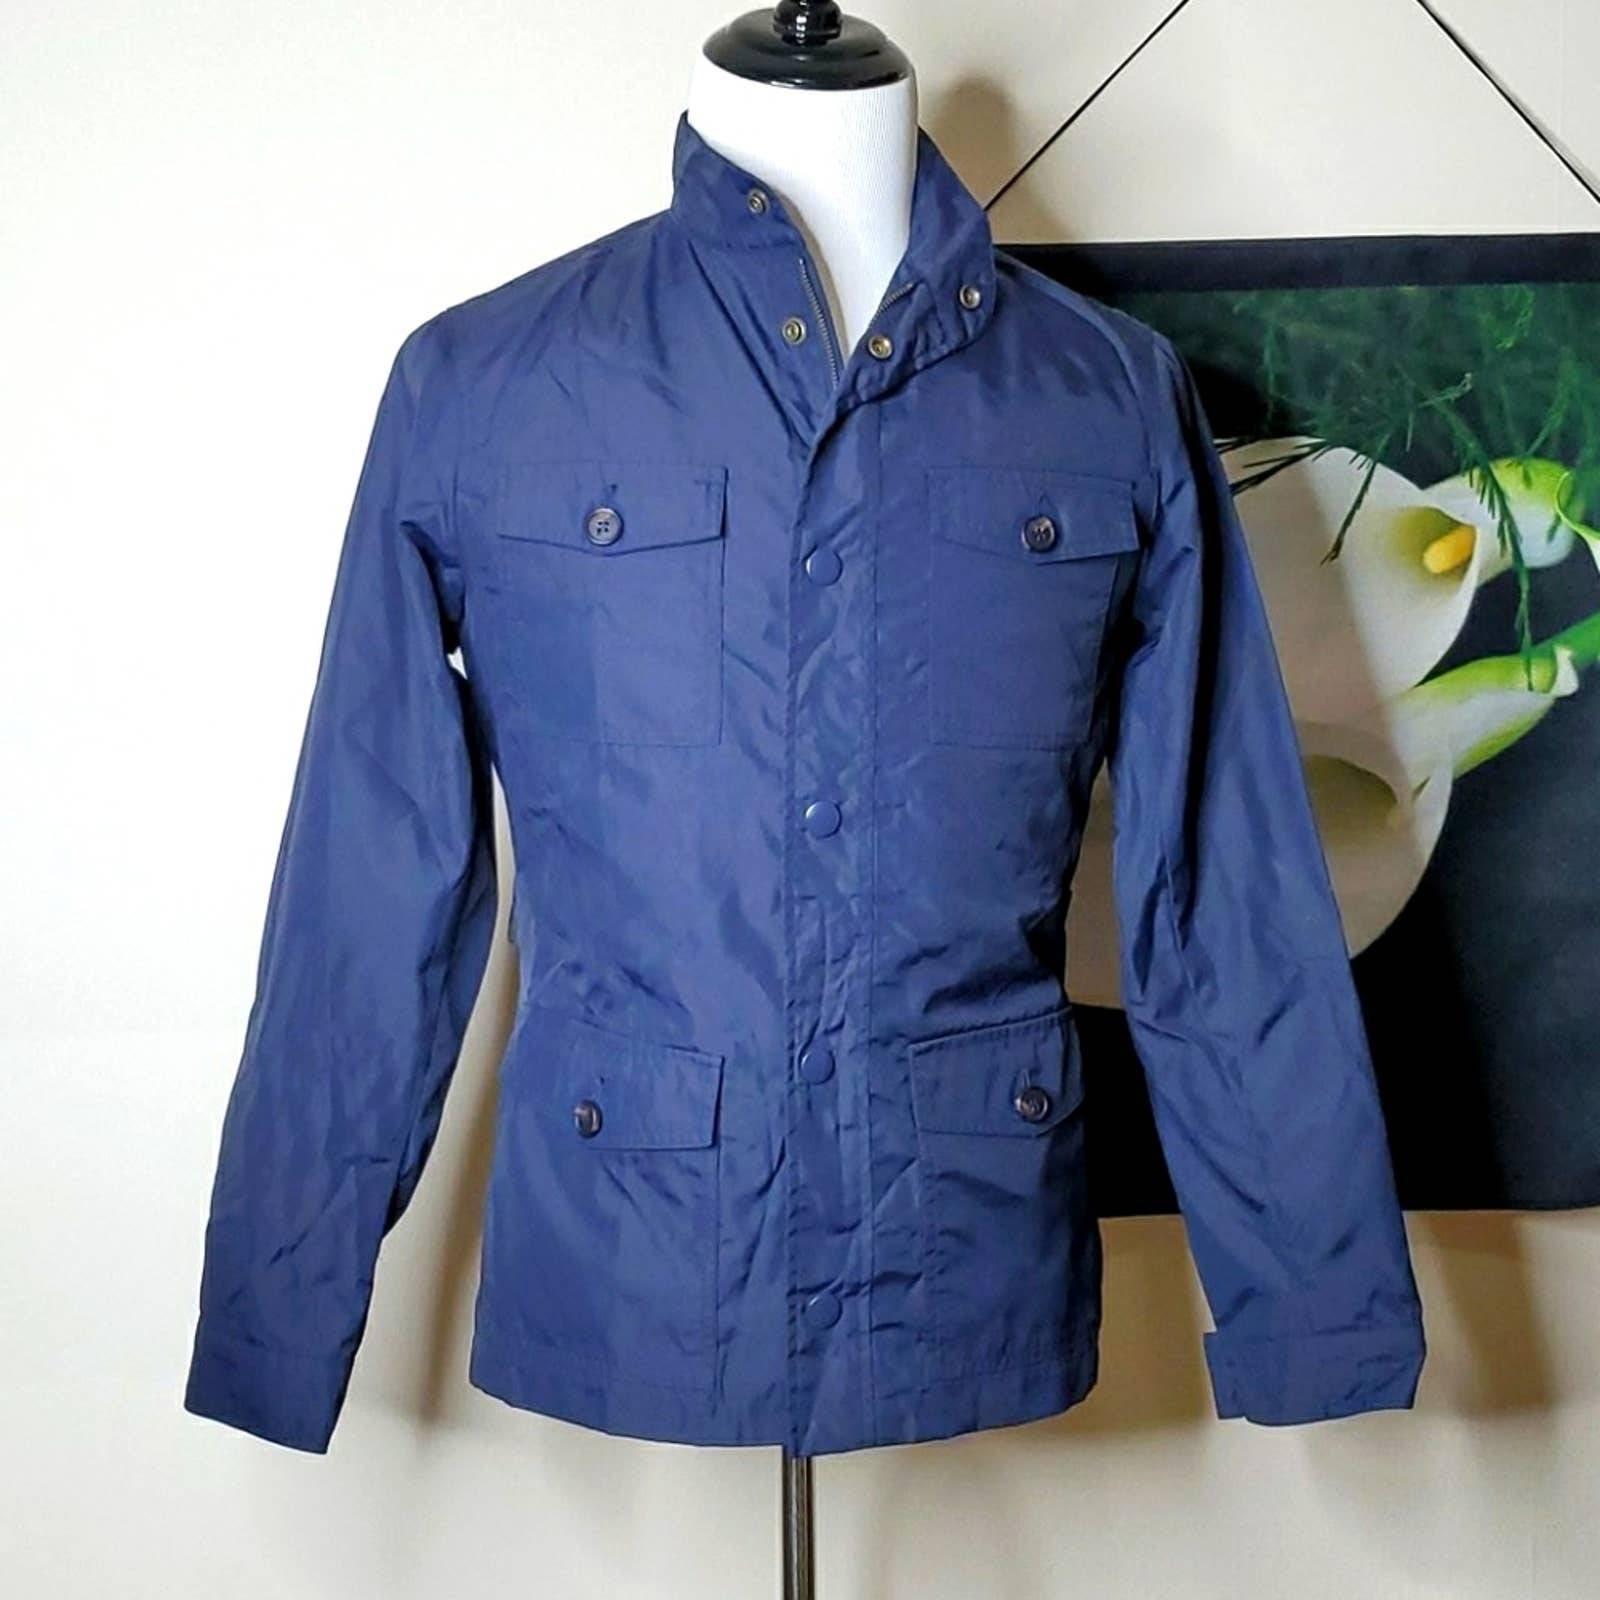 Men's Three Truths Utility Rain Jacket